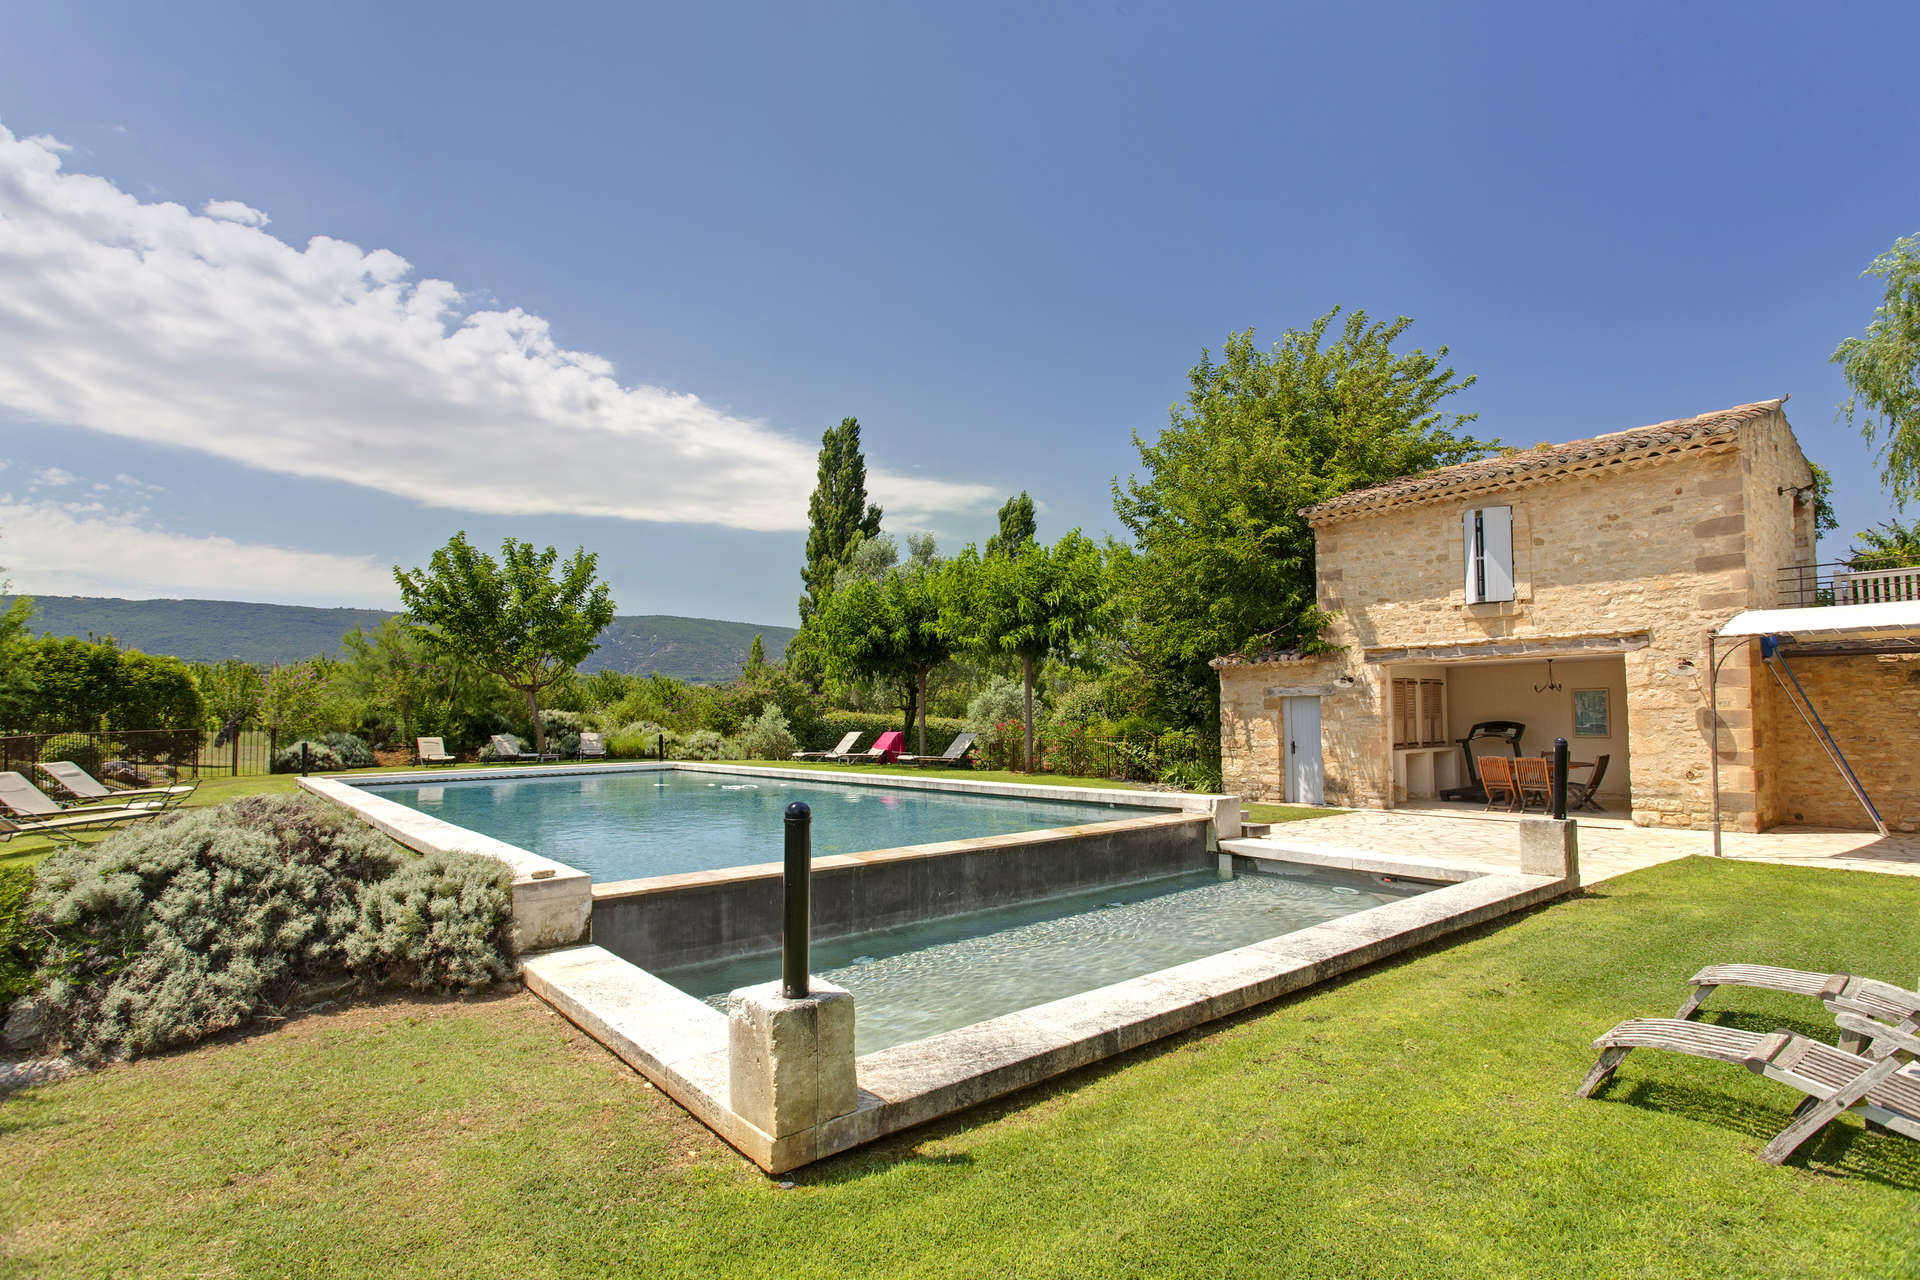 Luxury vacation rentals europe - France - Provence ih - Provence luberon - Bastide de l'Oratoire - Image 1/21